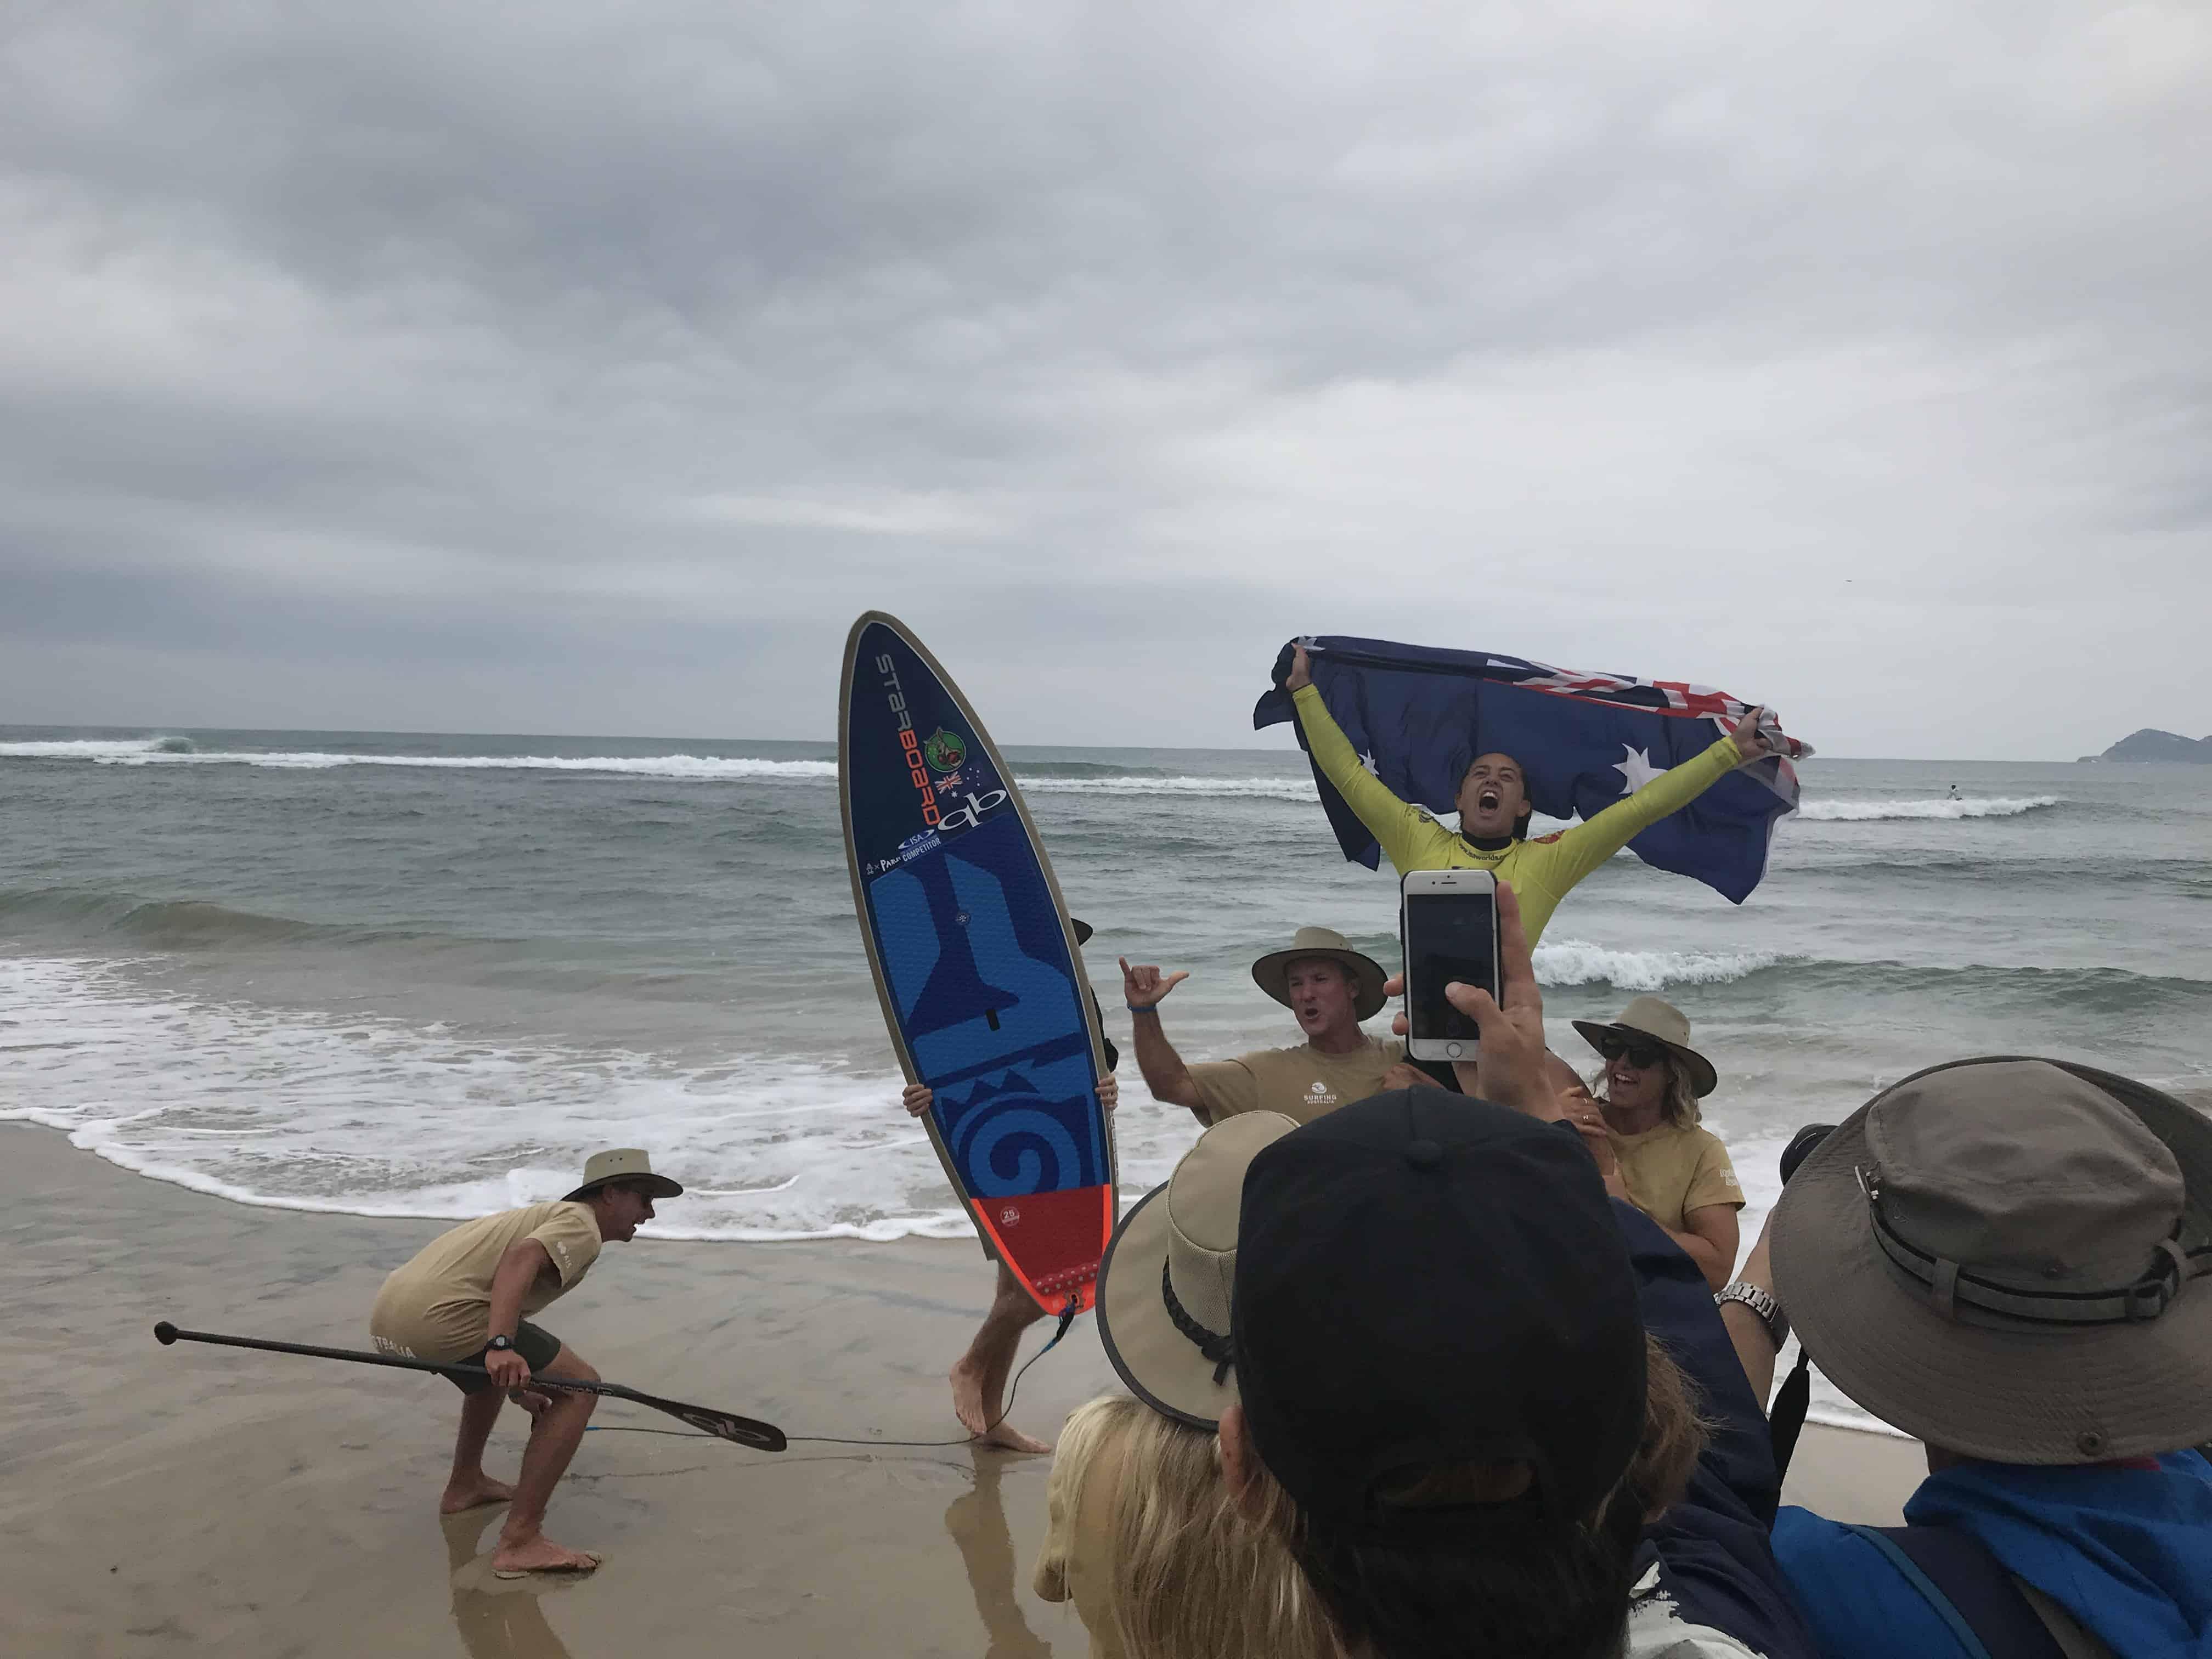 Shakira Westdorp, Australian SUP surf world champion